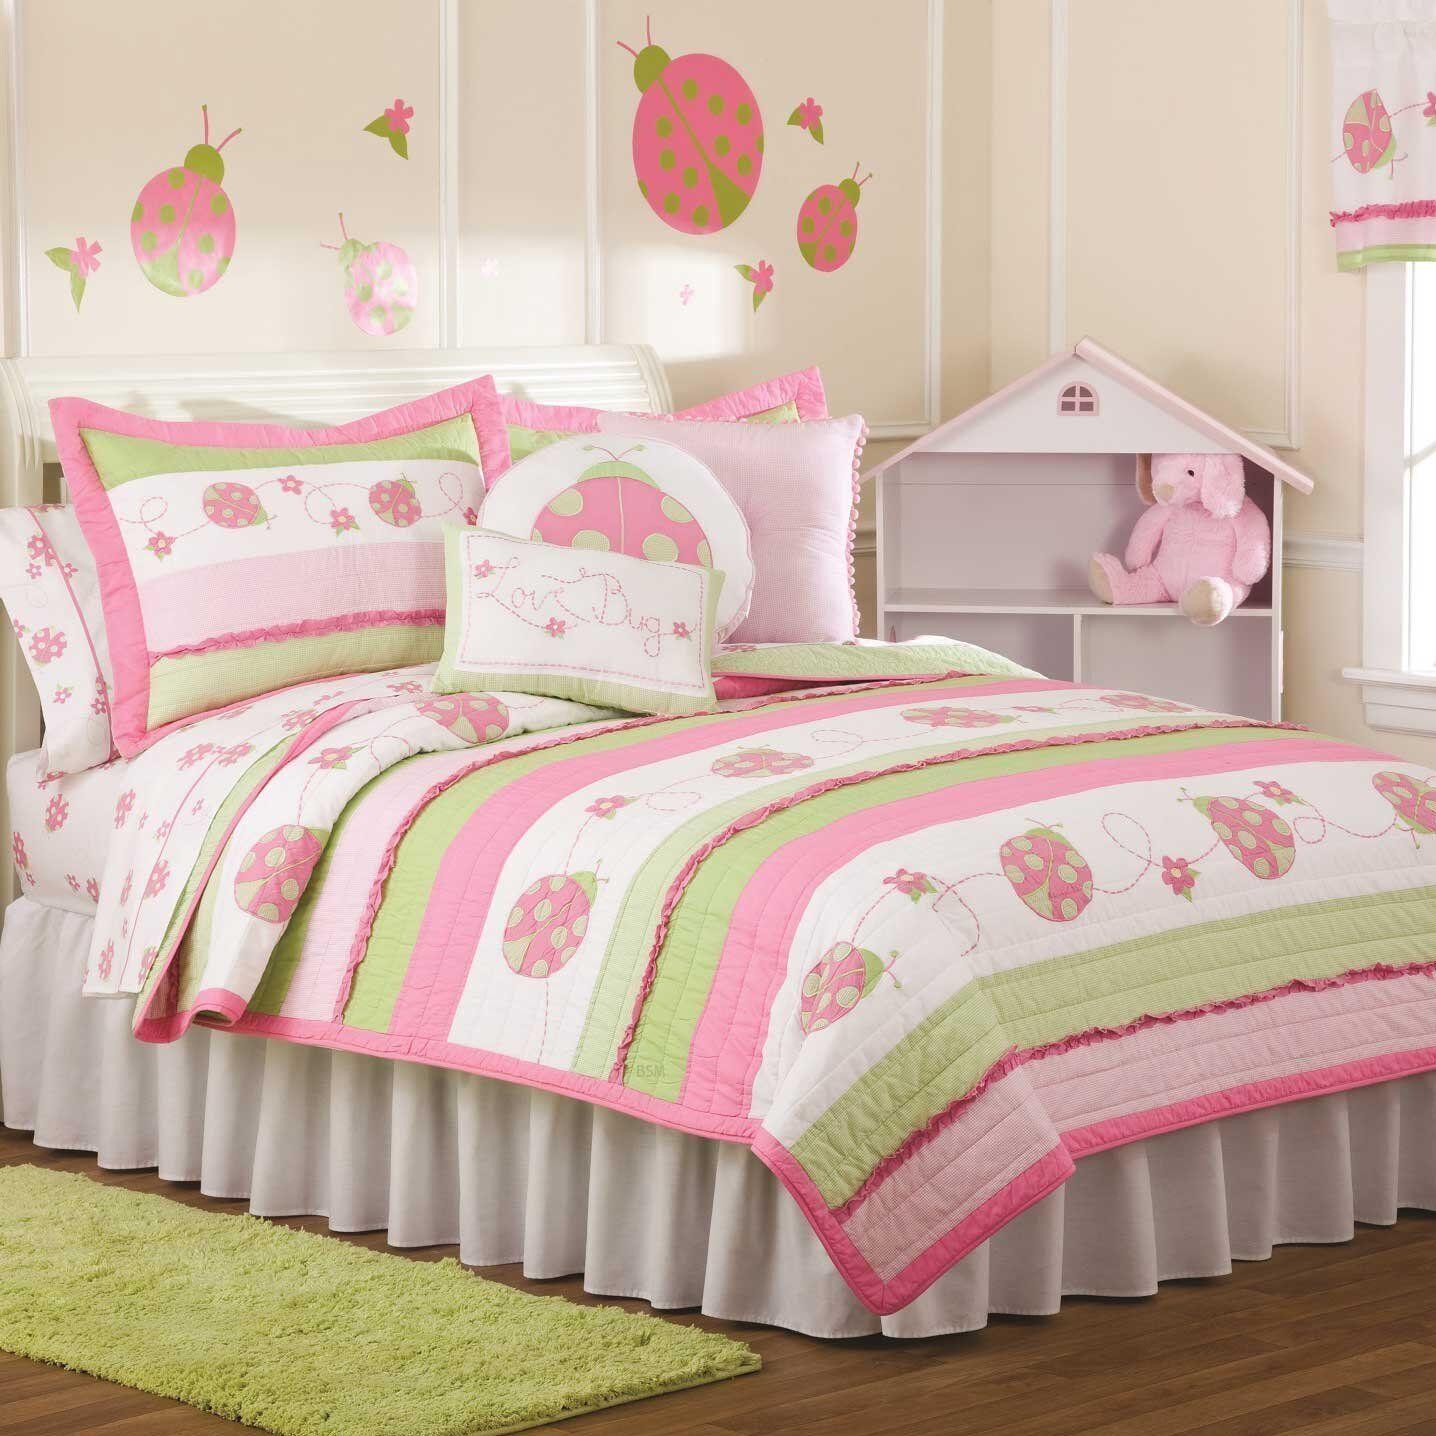 Crazy Rose Coccinelle pleine reine Couette  Filles Rose Vert Lady Bug Garden Bed